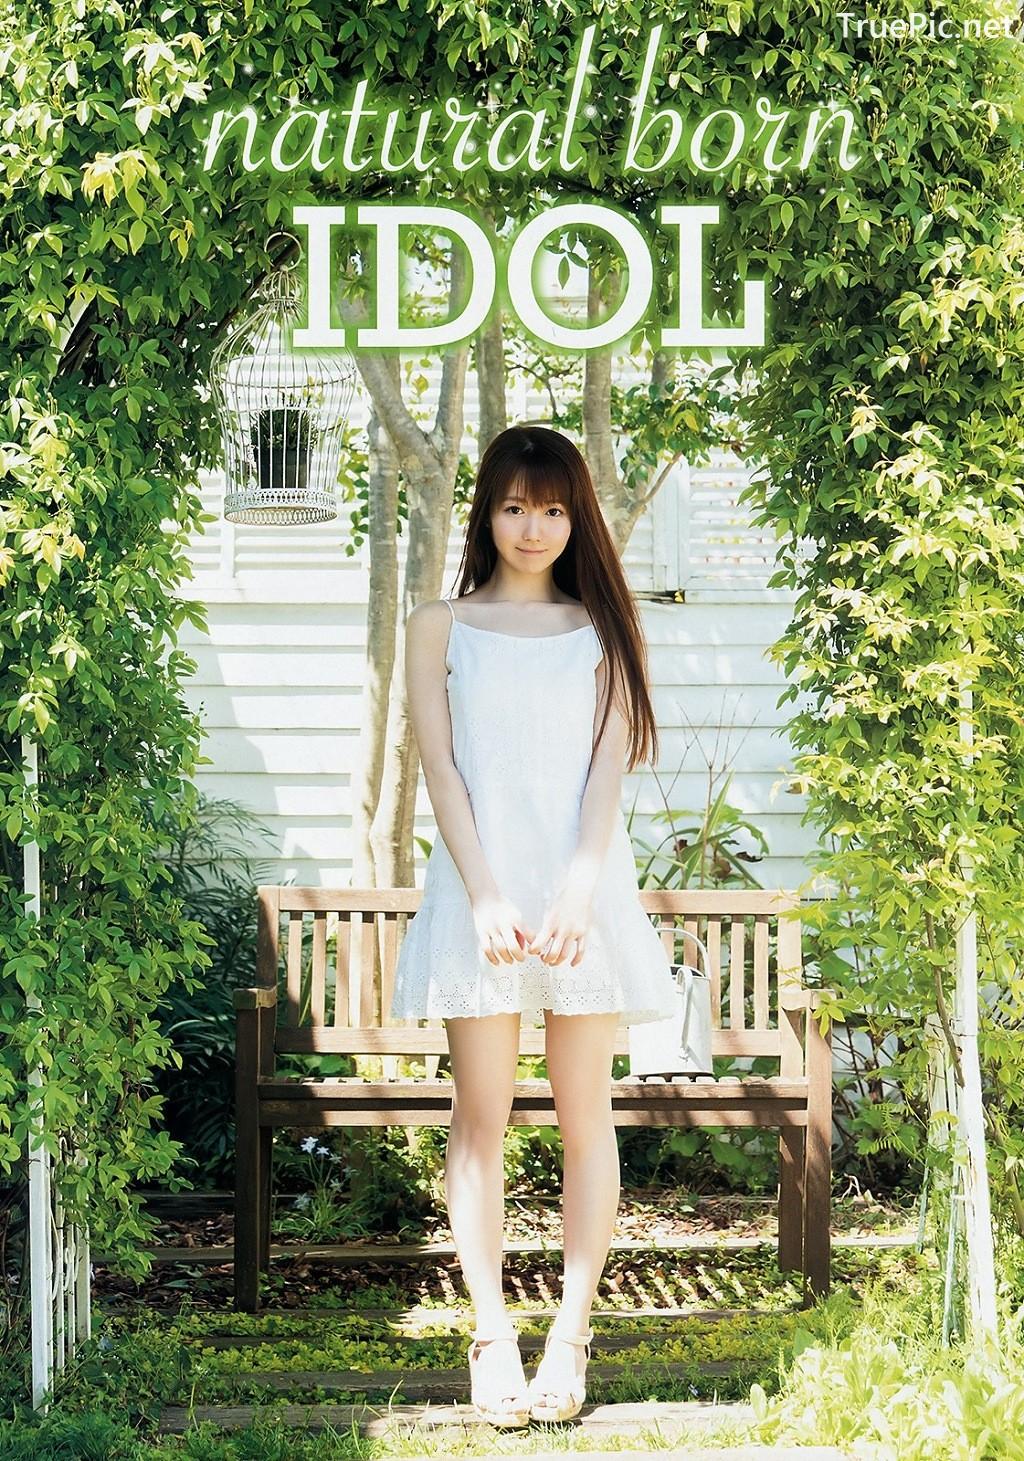 Image Japanese Singer And Idol - Otani Emiri - [Young Animal] 2019 No.13 - TruePic.net - Picture-2